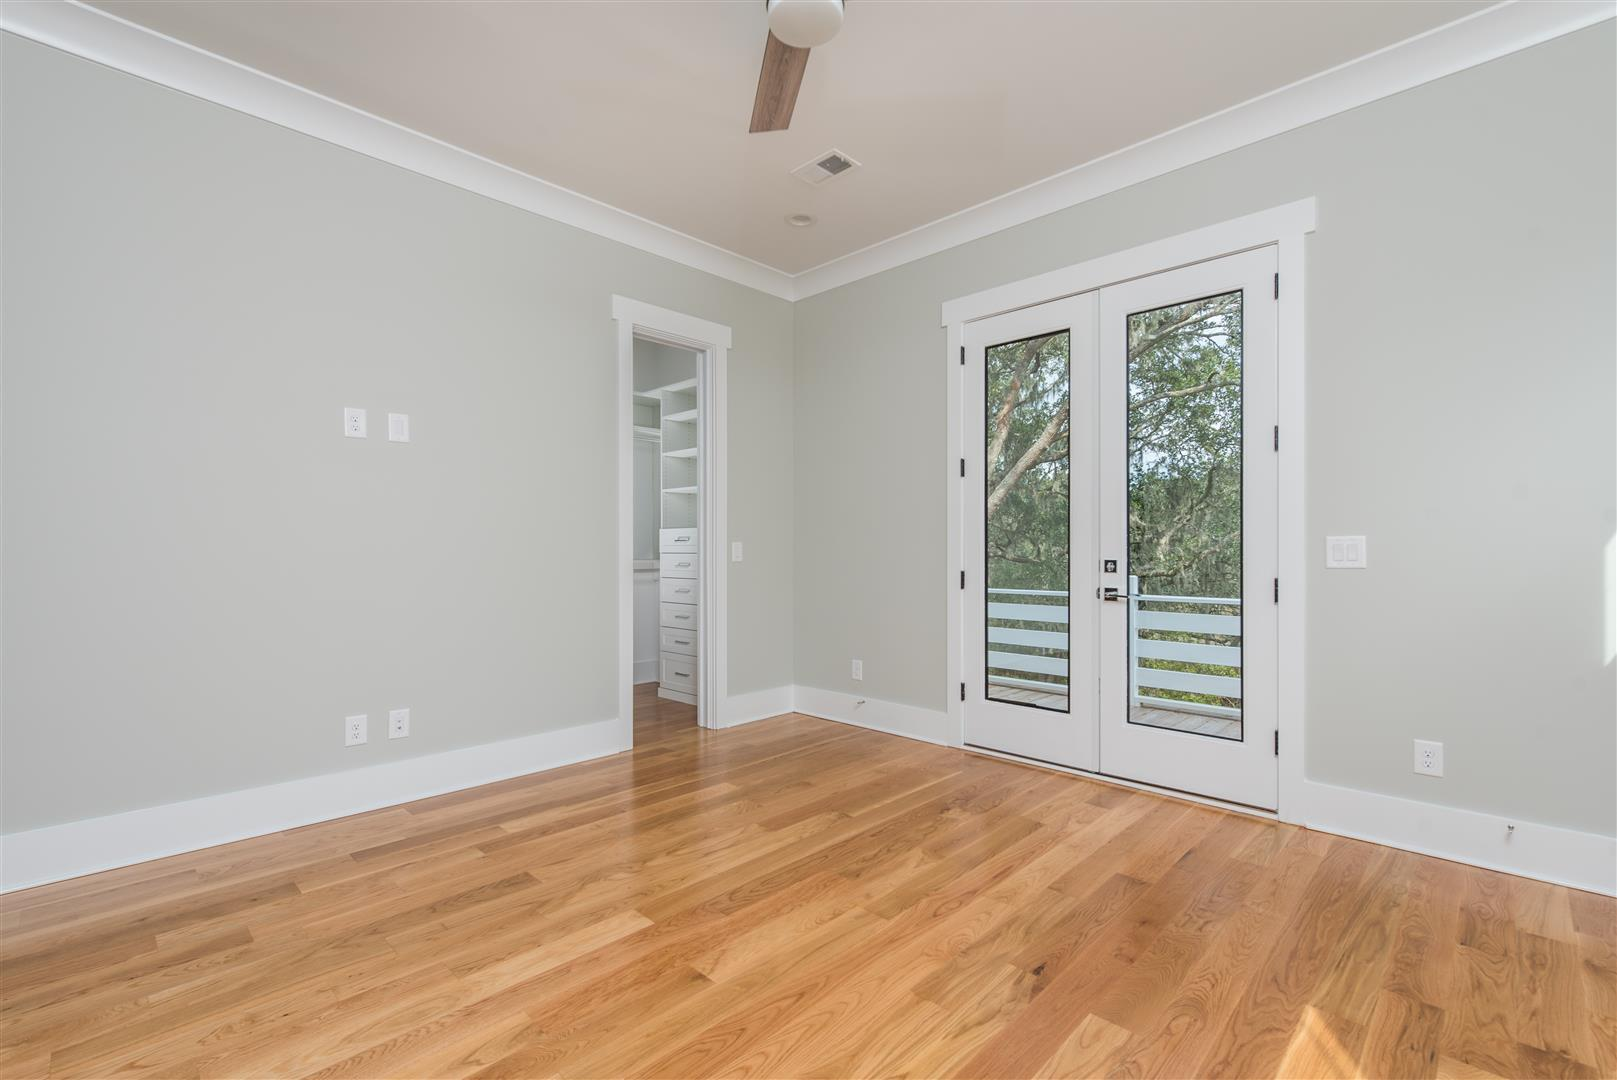 Scanlonville Homes For Sale - 160 5th, Mount Pleasant, SC - 9